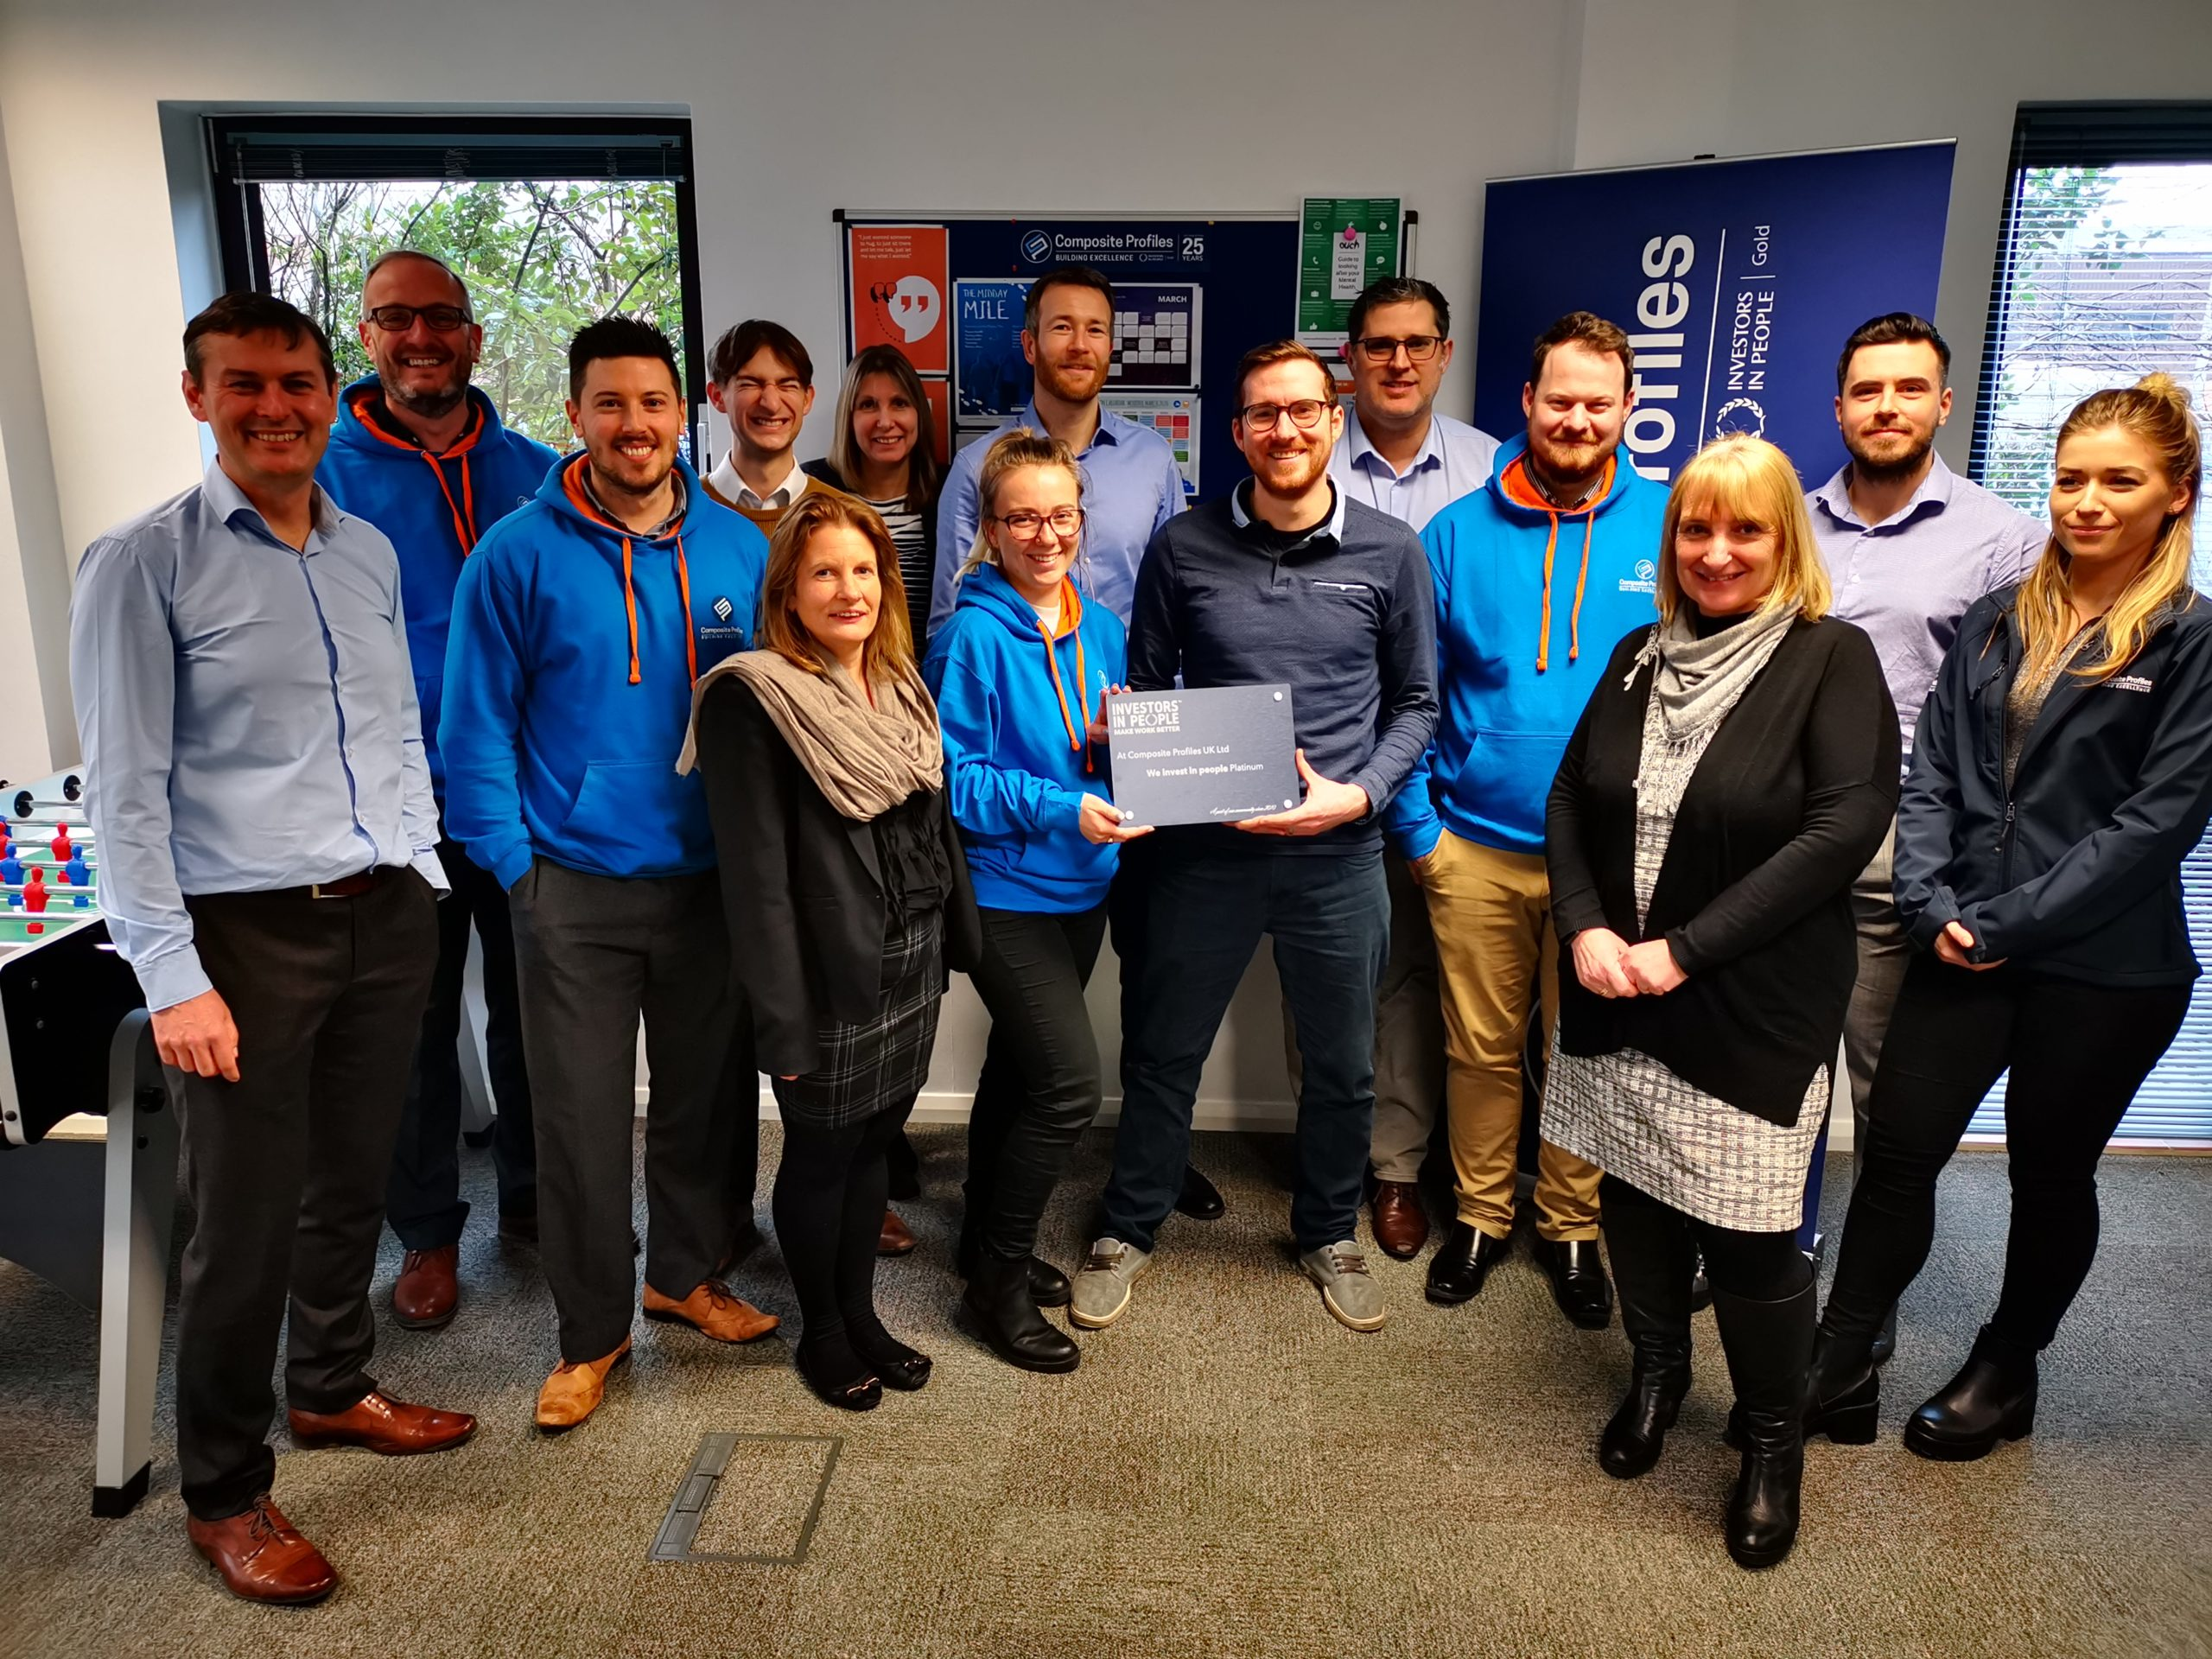 Invest in People Platinum Award presented to Composite Profiles team